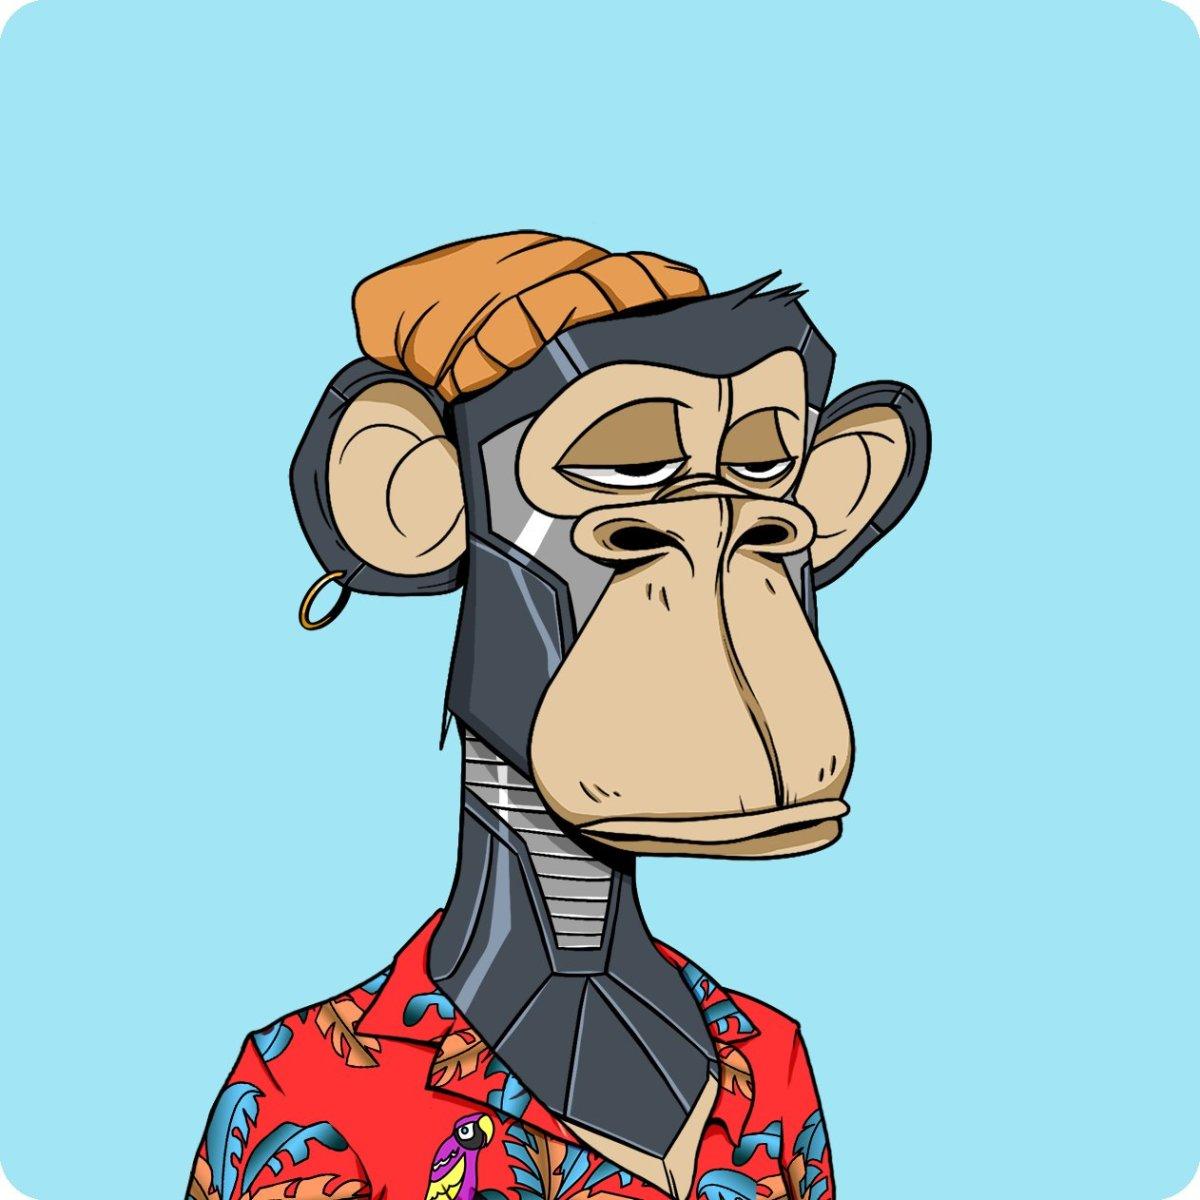 Josh Ong's Bored Ape